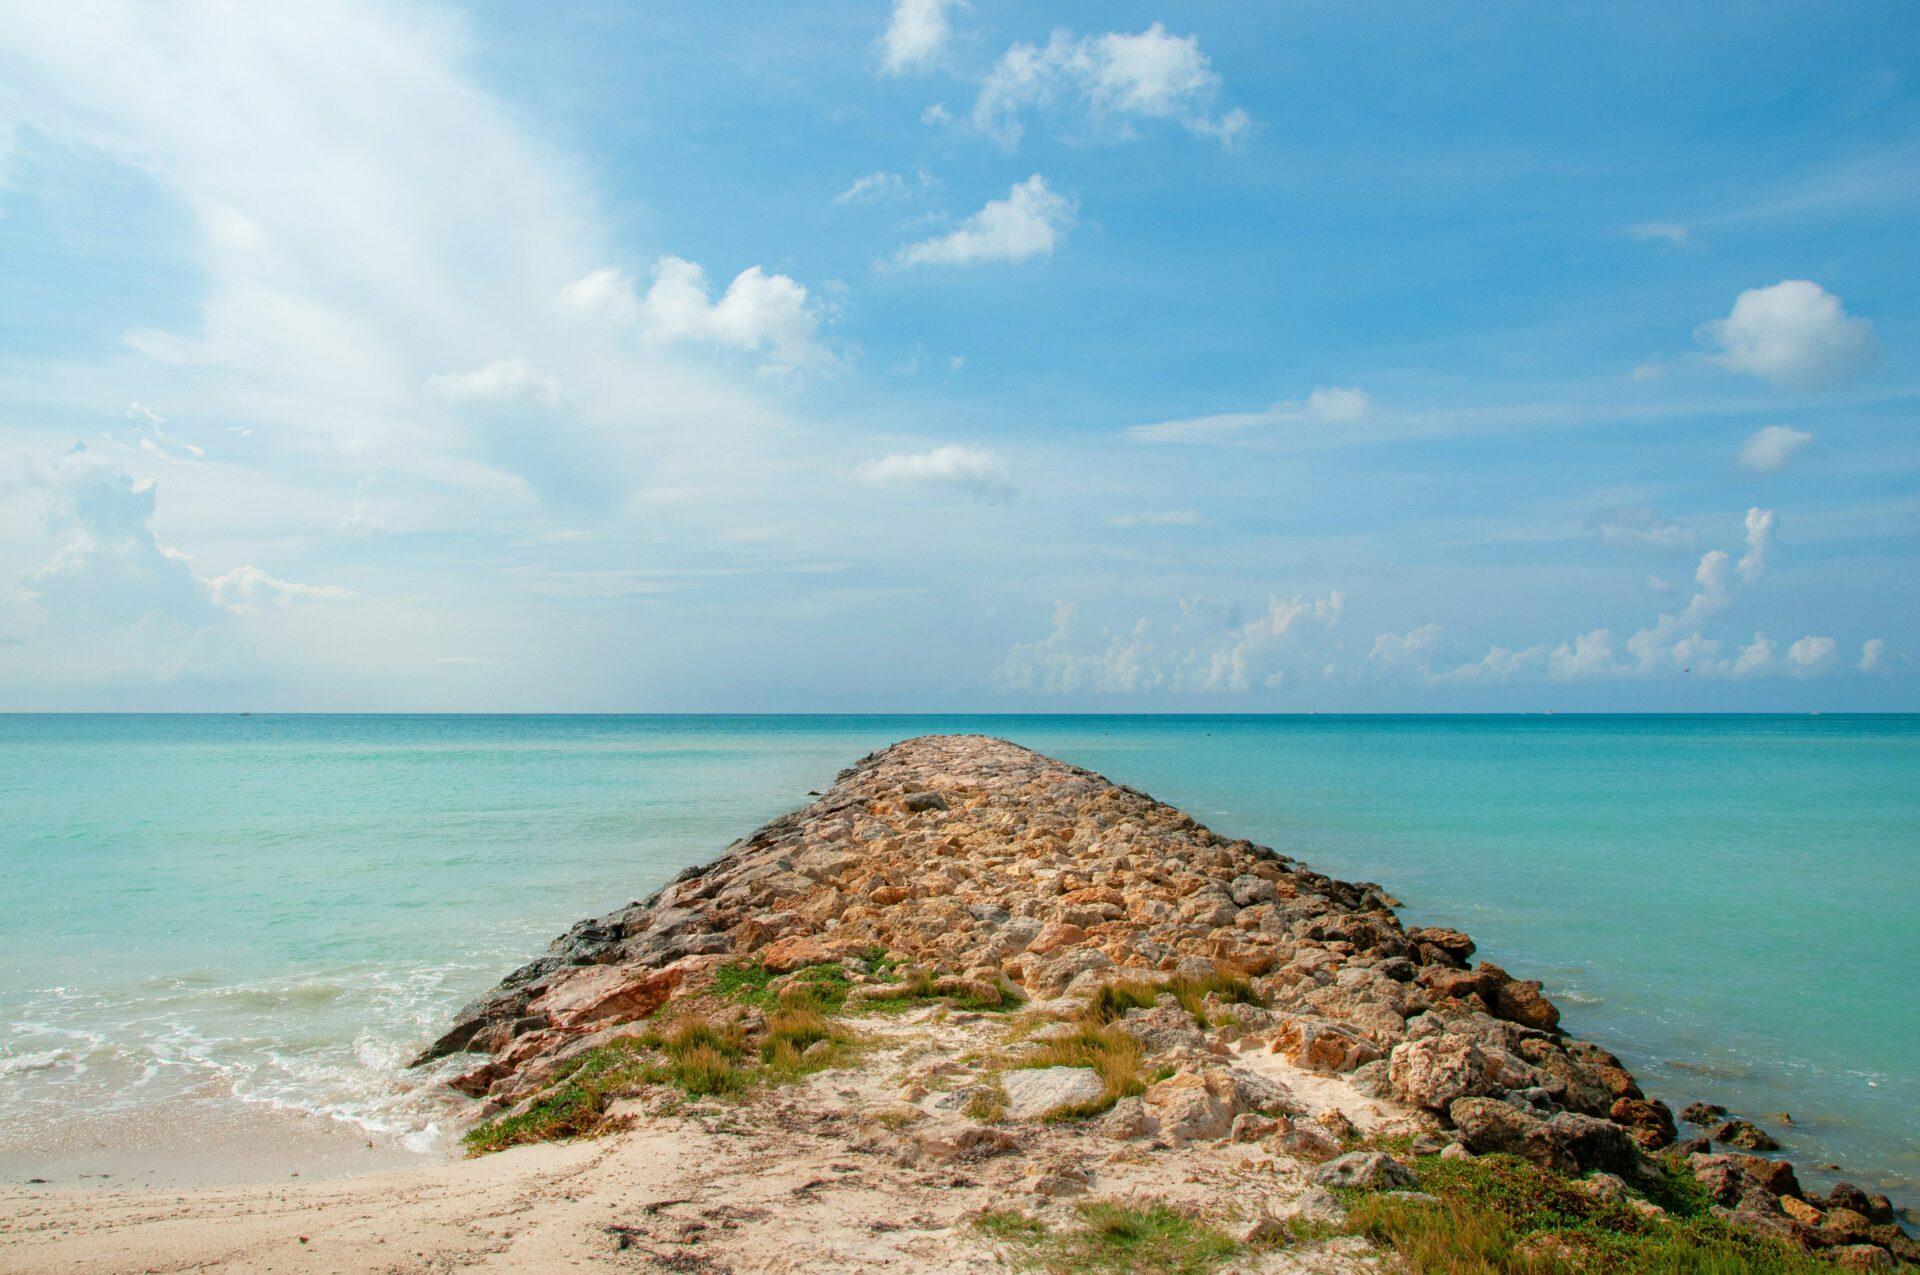 Duurzaam reizen - Reisblog België TravelRebel - ARUBA - KLM